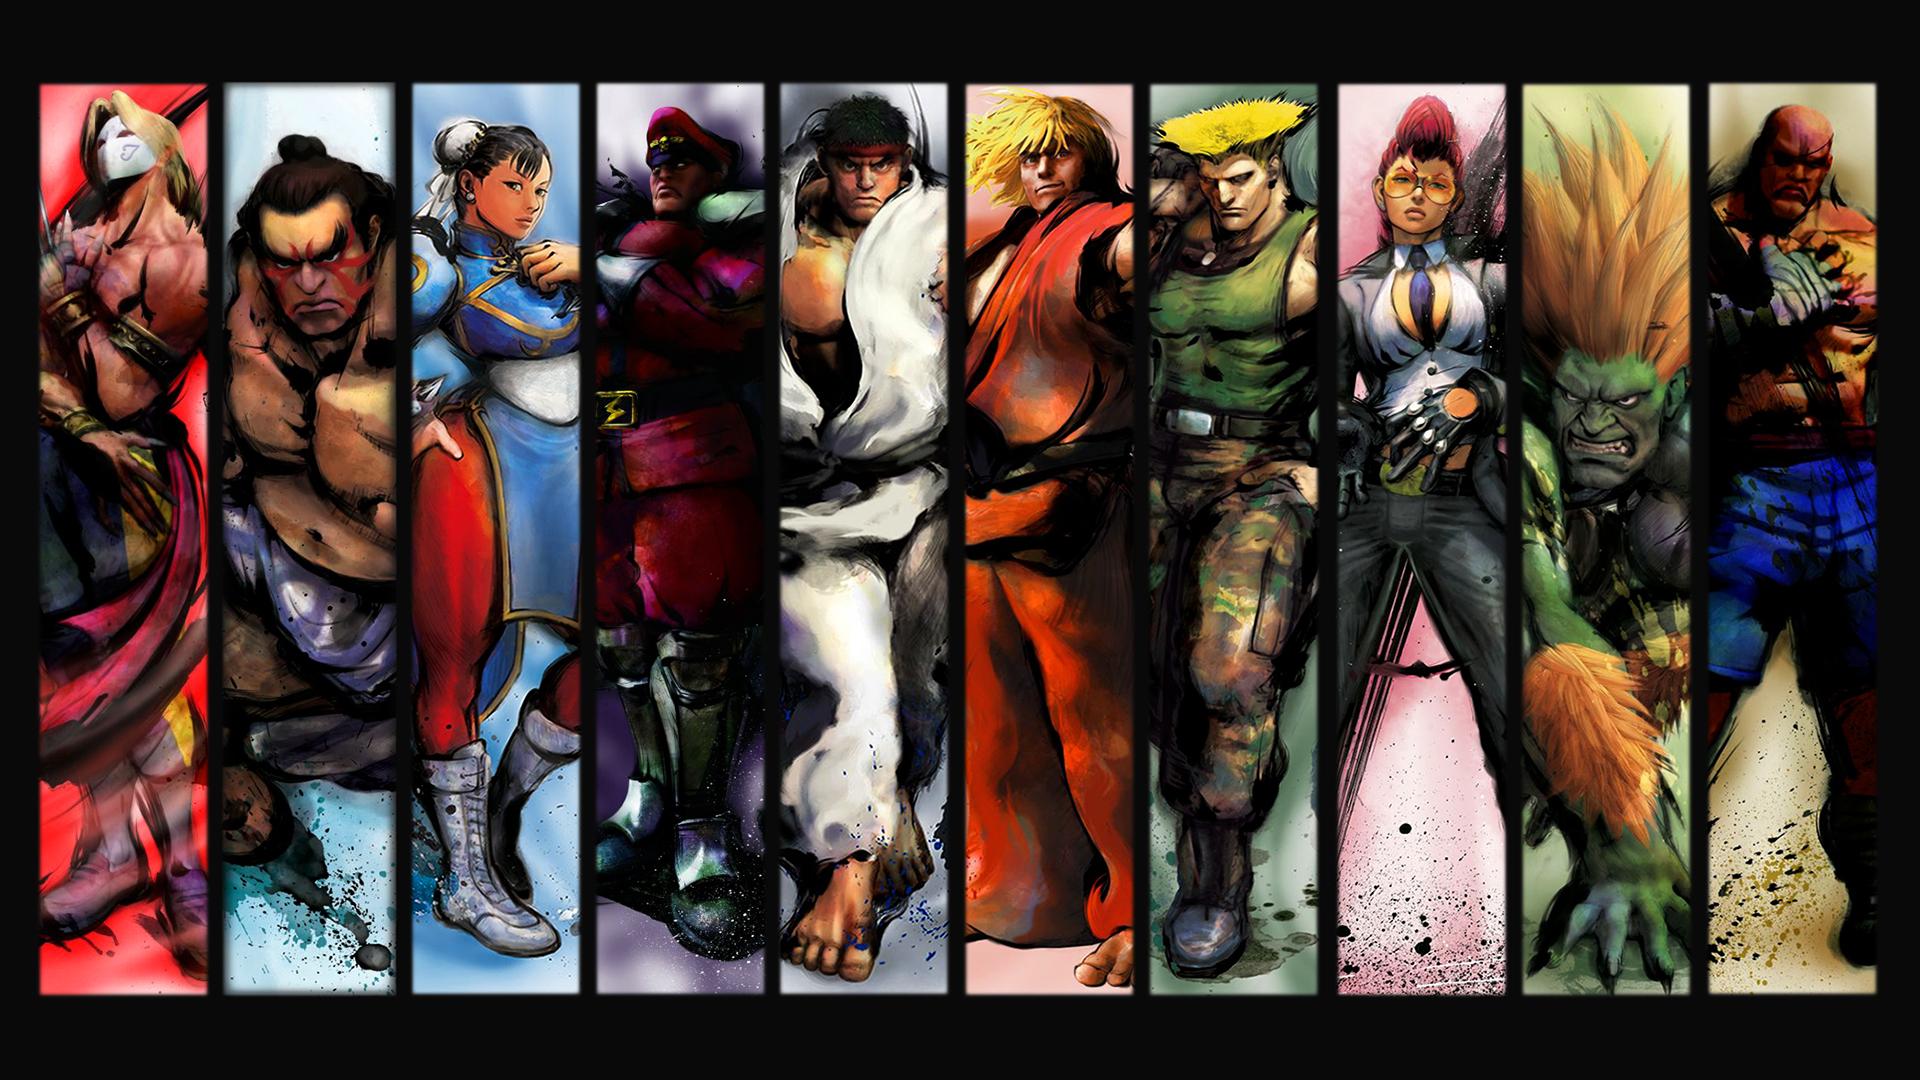 1000+ ideas about Street Fighter Wallpaper on Pinterest | Street